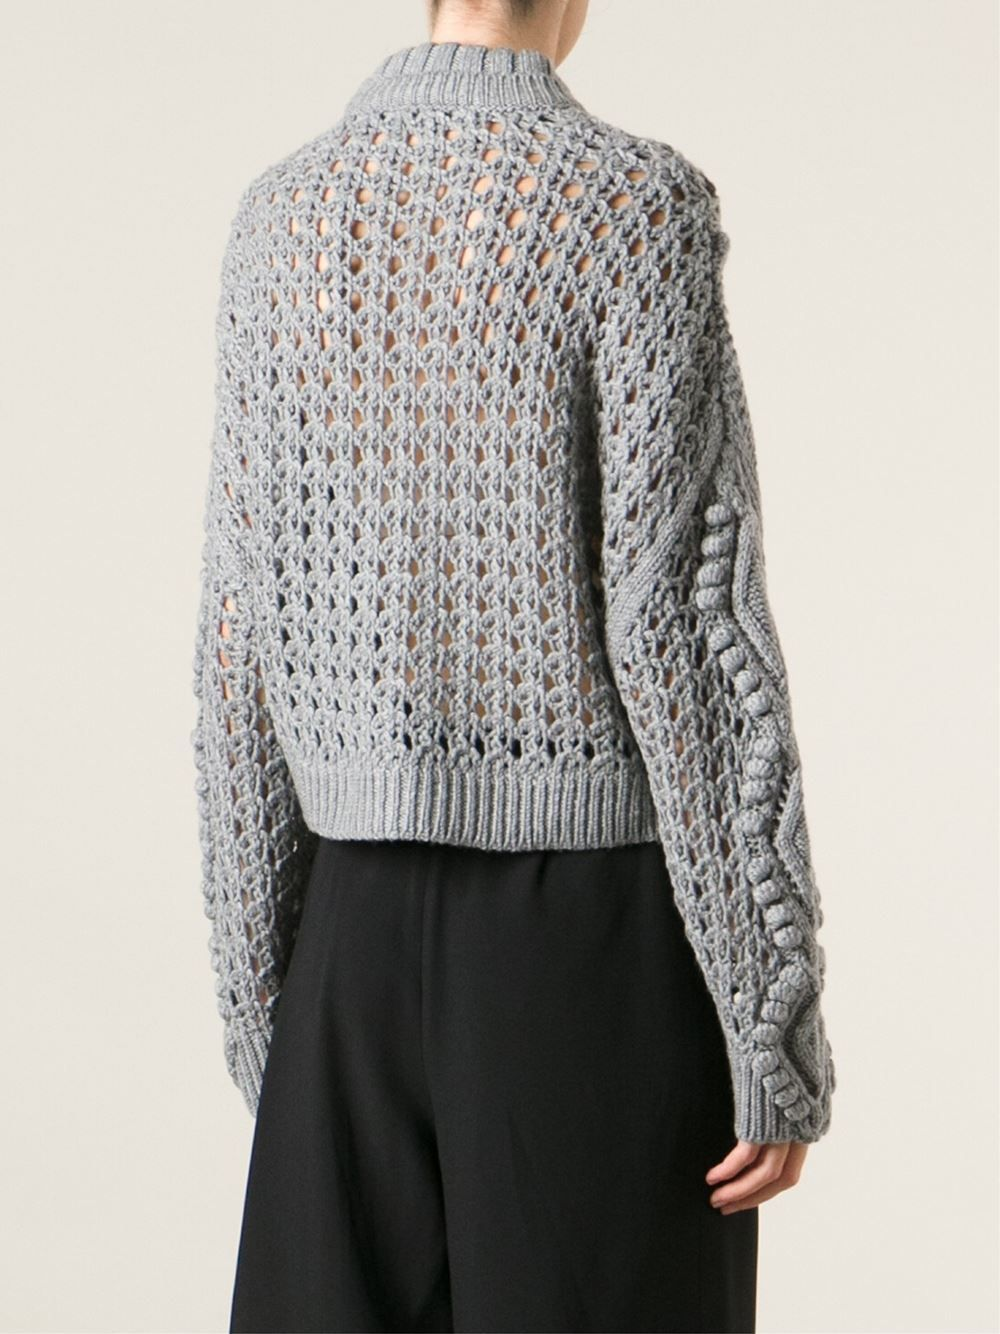 Ermanno Scervino cable knit jumper - Blanco farfetch el-gris Casual RuFxHghIE